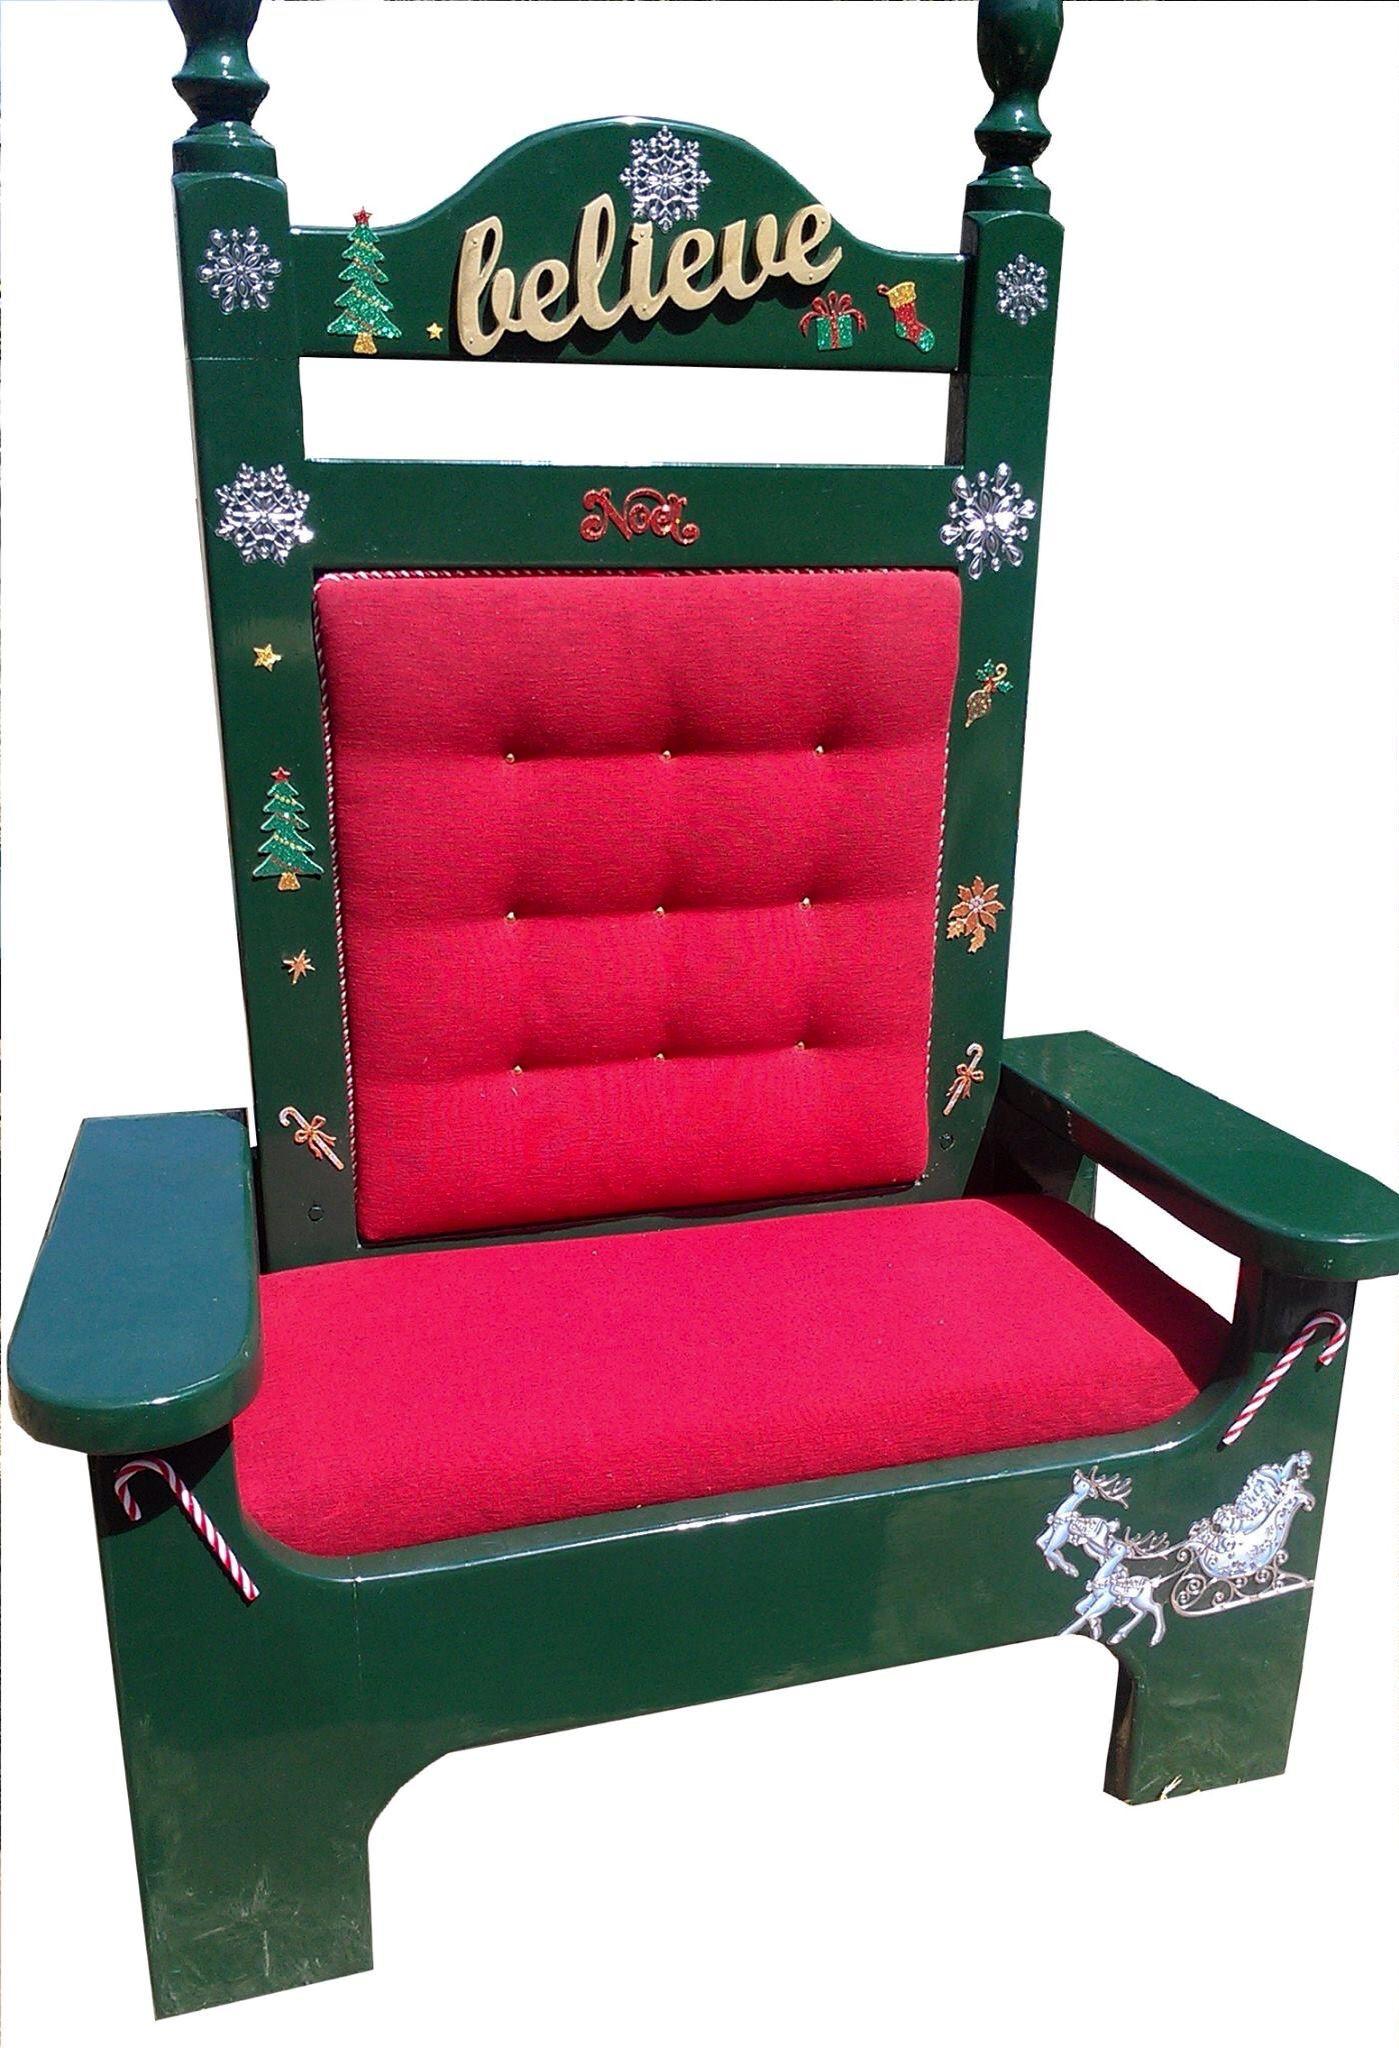 Santa Ion Loxton's Chair Christmas furniture, 40th